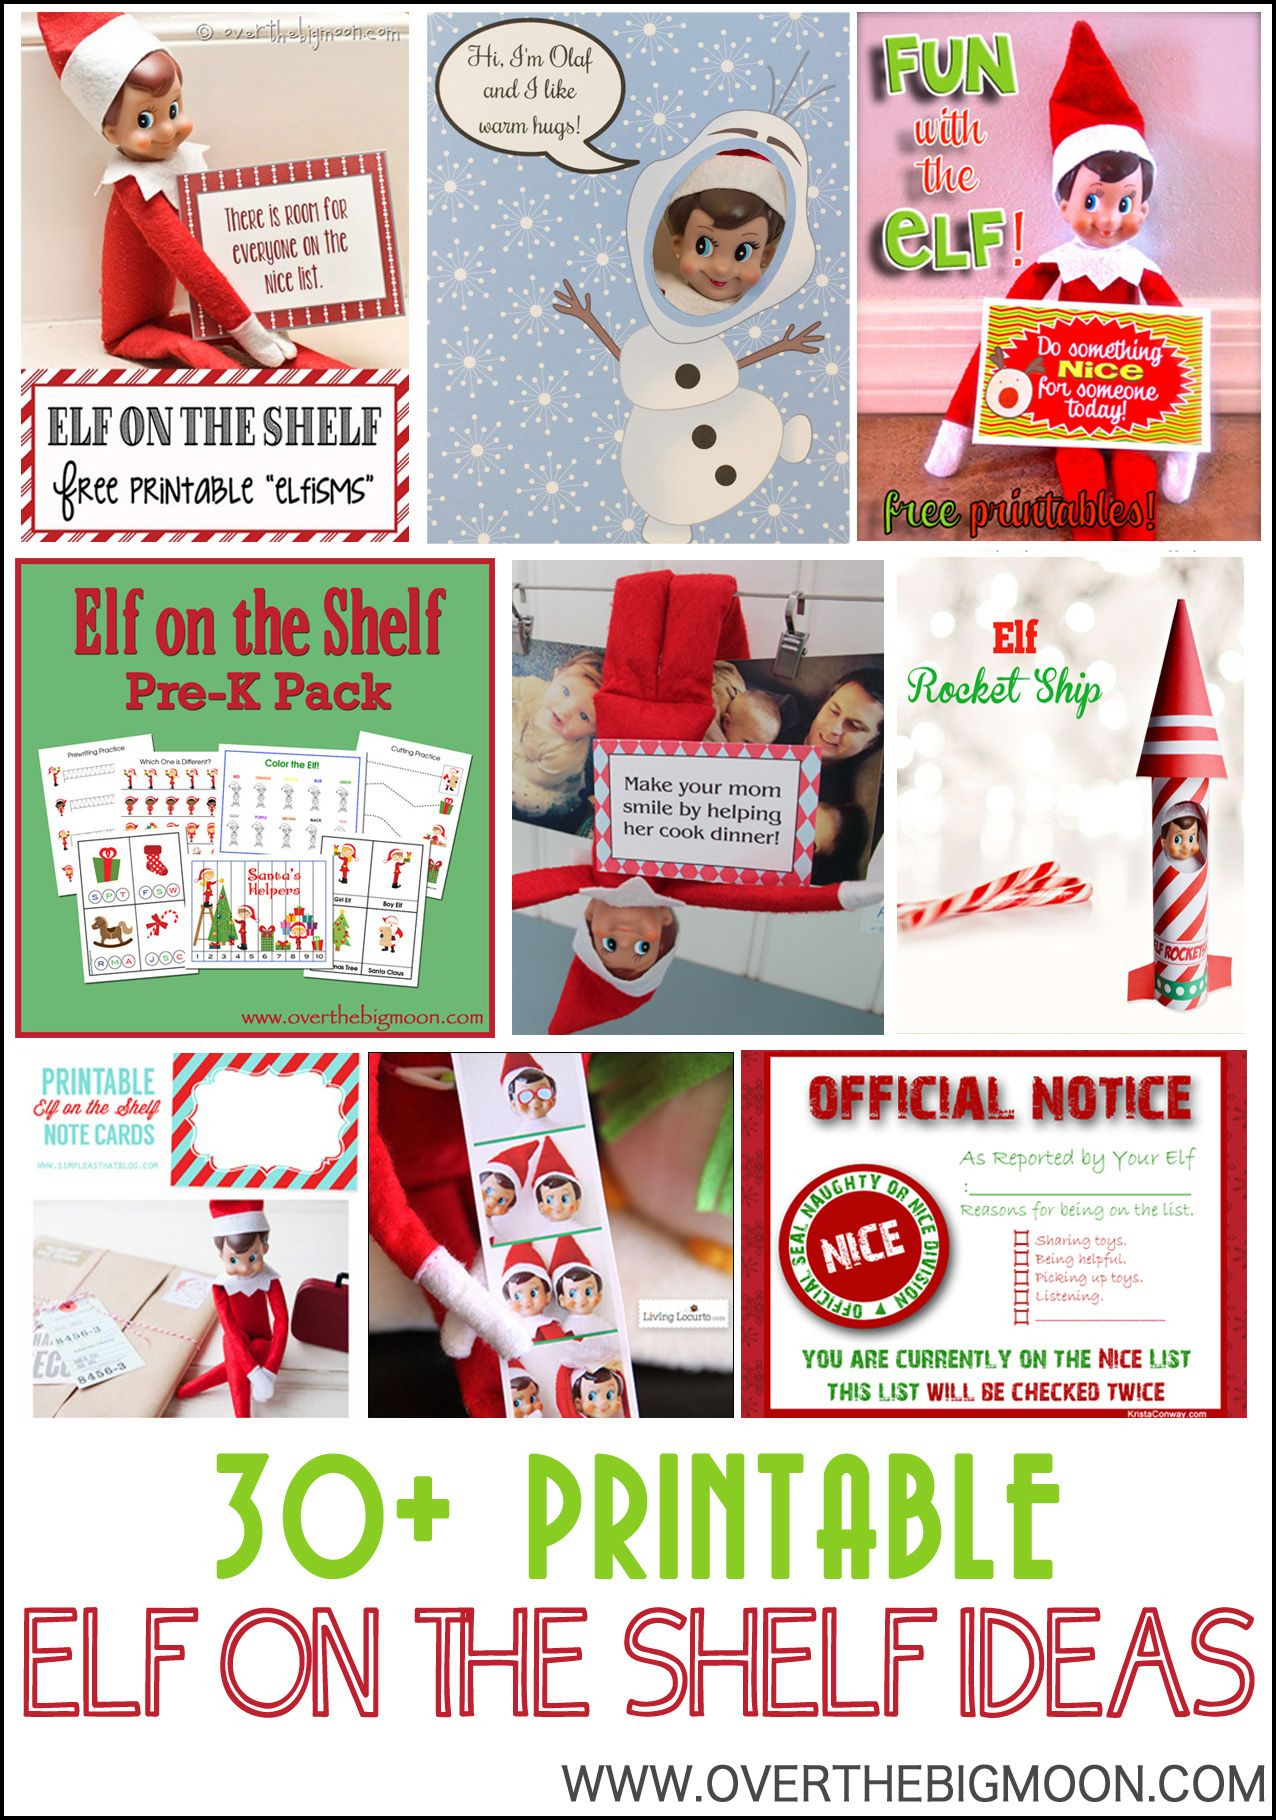 30+ Printable Elf On The Shelf Ideas | Elf On The Shelf Ideas - Elf On The Shelf Free Printable Ideas